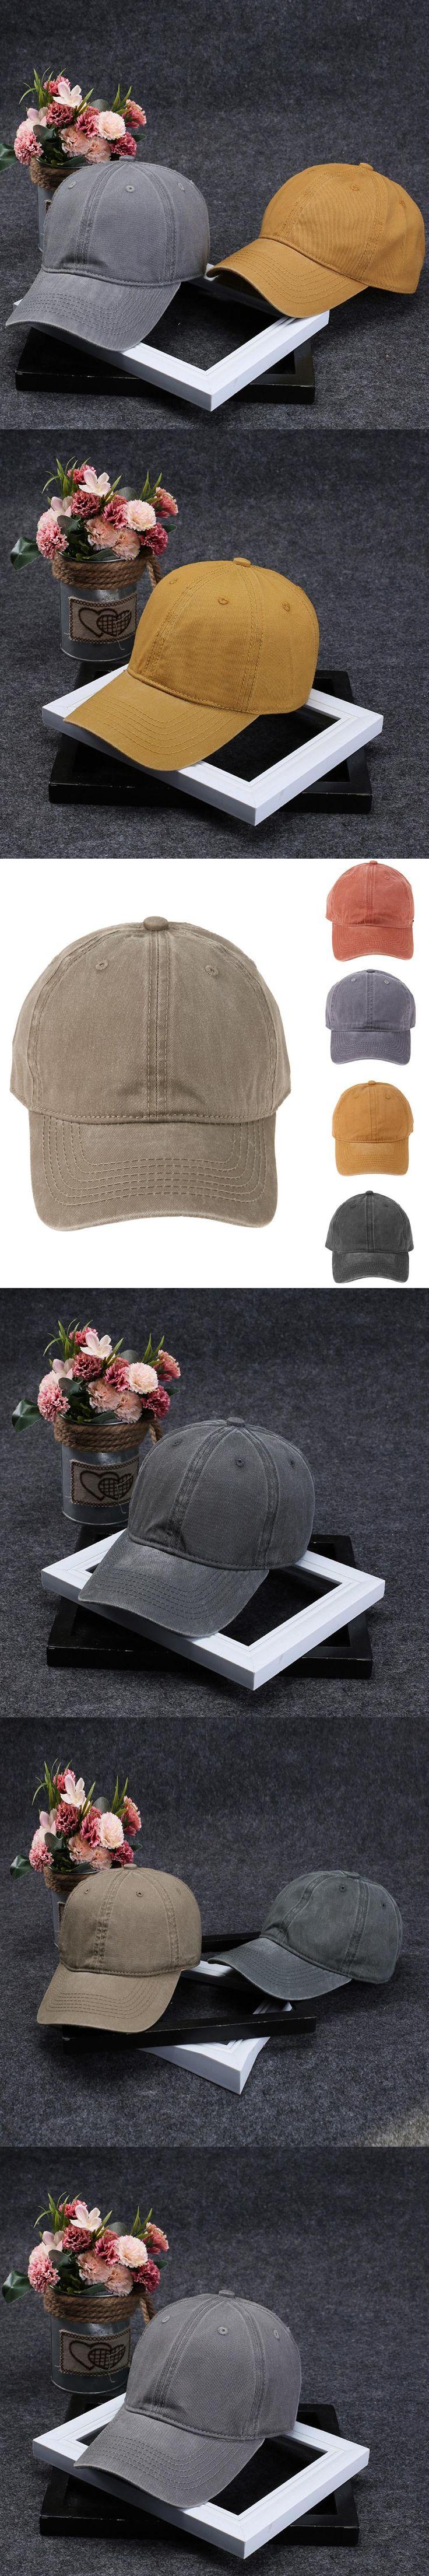 2017 Fashion Snapback Baseball Cap New Gorras Trucker cap Washed Cotton HipHop Flat Hat Adjustable Casquette Men&Women